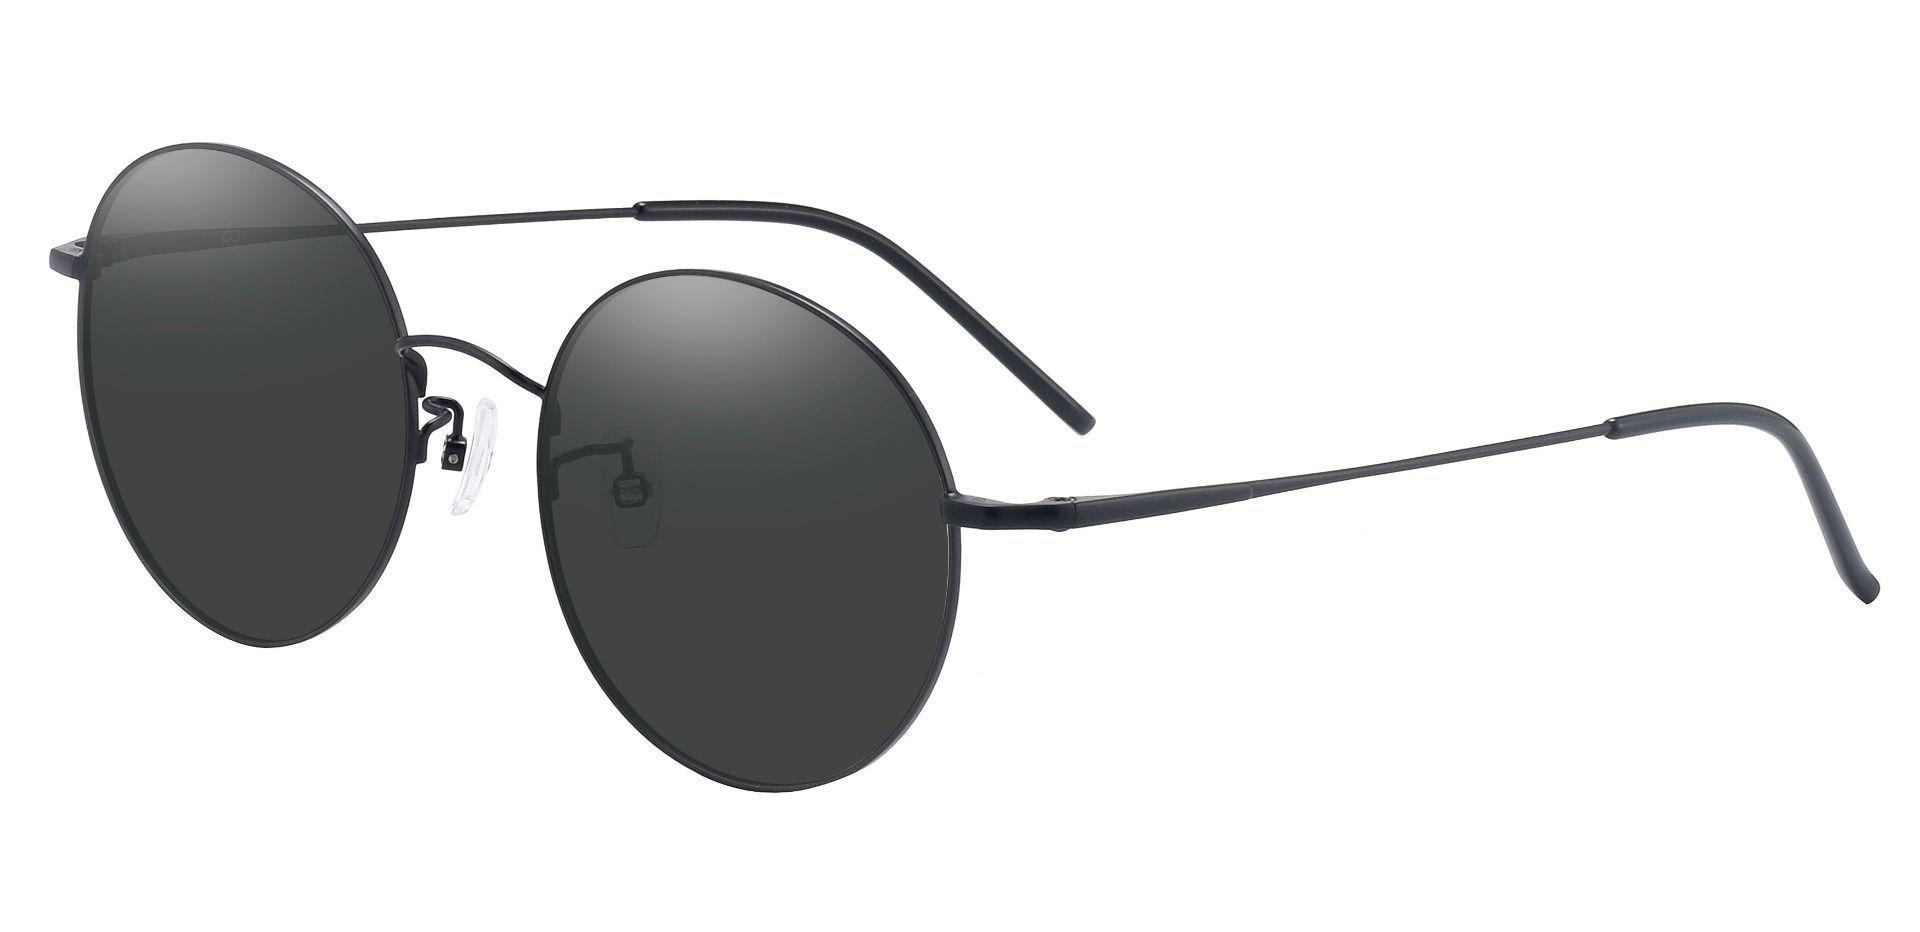 Bravo Round Prescription Sunglasses -  Black Frame With Gray Lenses